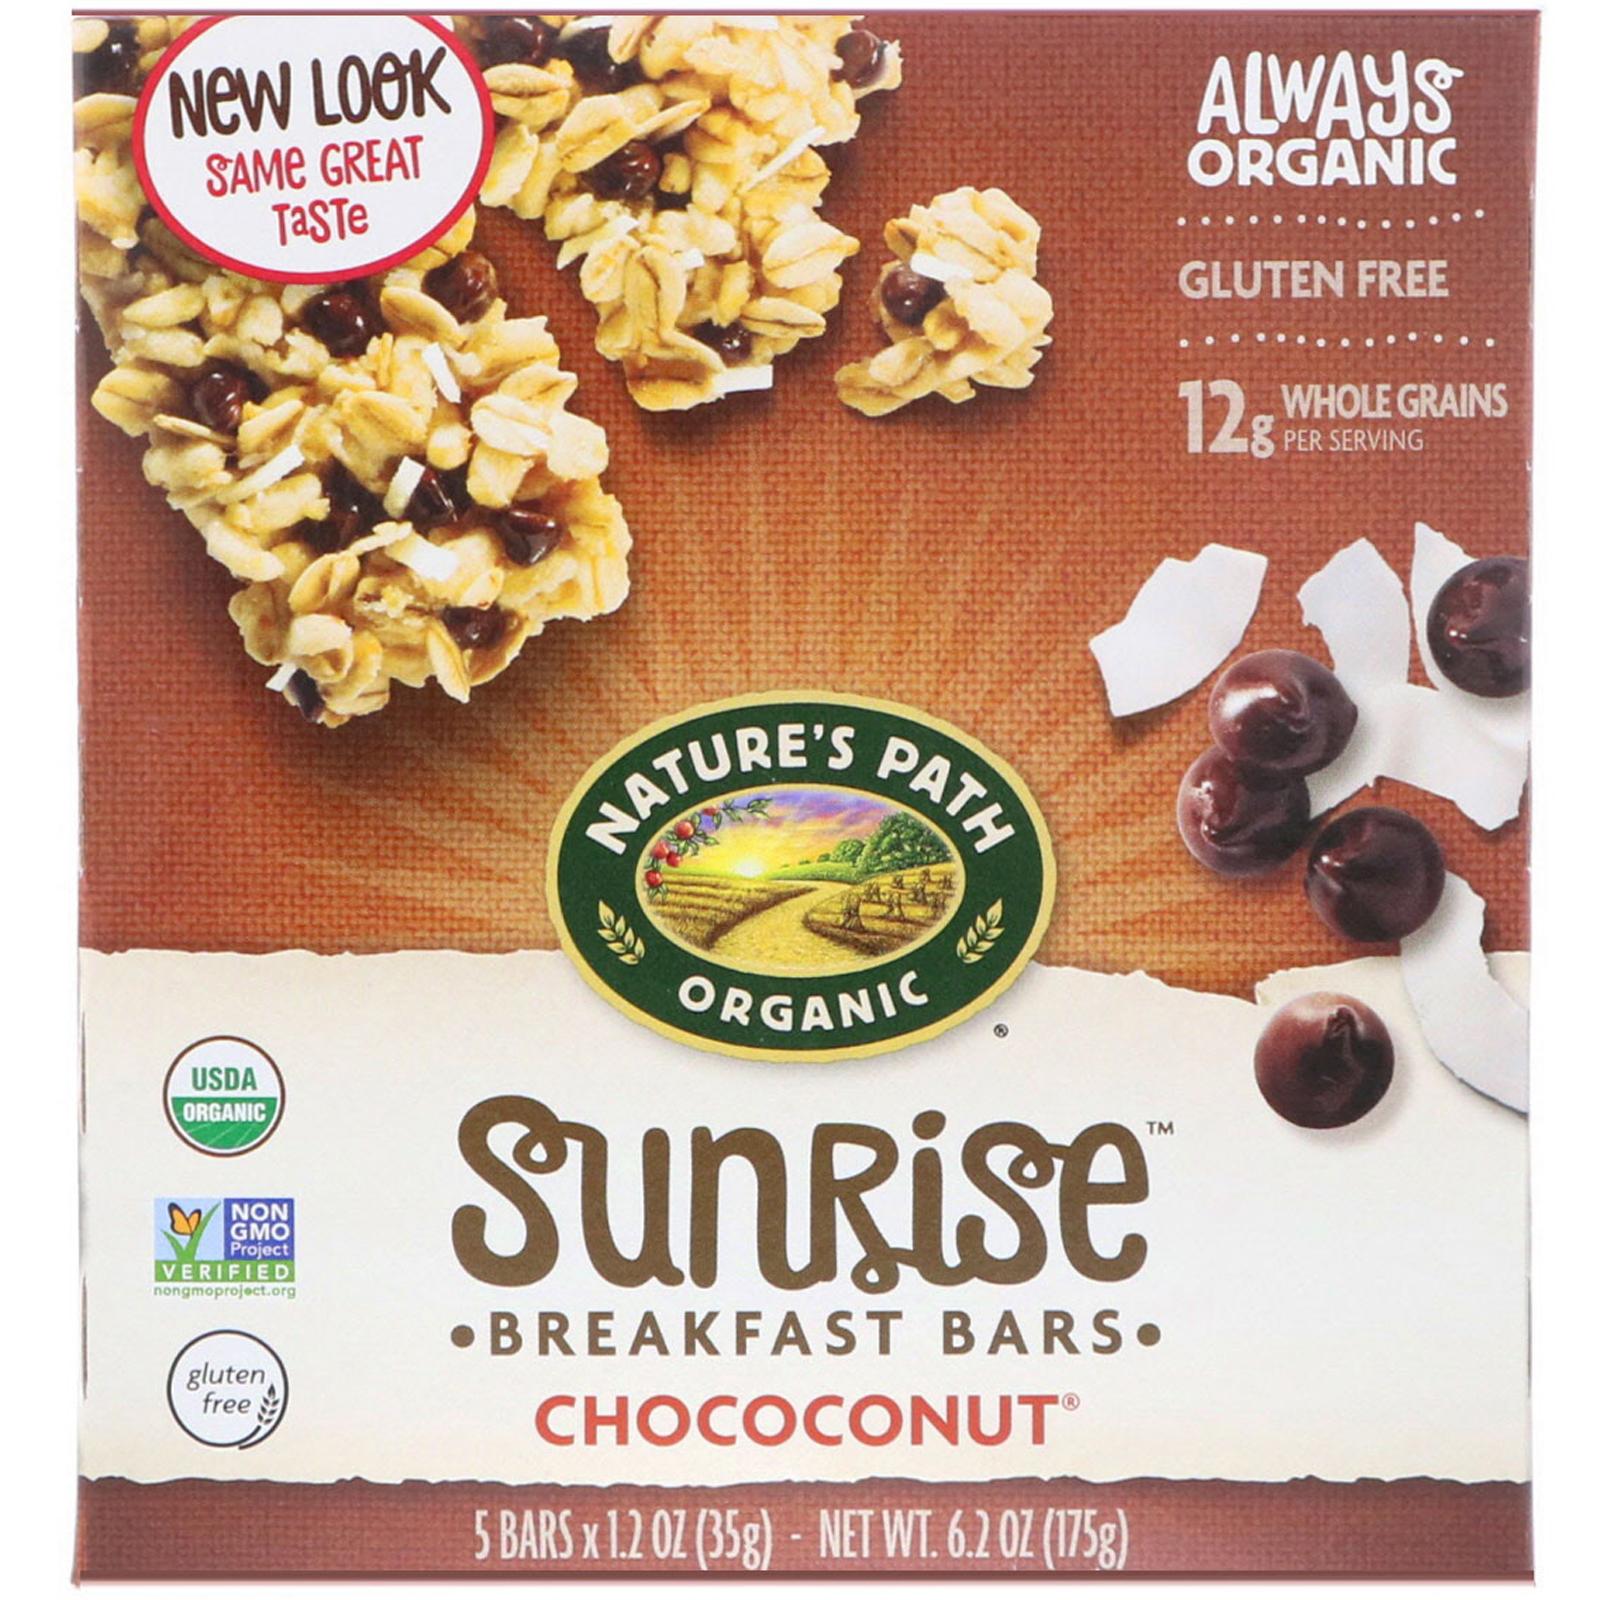 Nature's Path, Organic, Sunrise Breakfast Bars, Chococonut, 5 Bars, 1.2 oz (35 g) Each